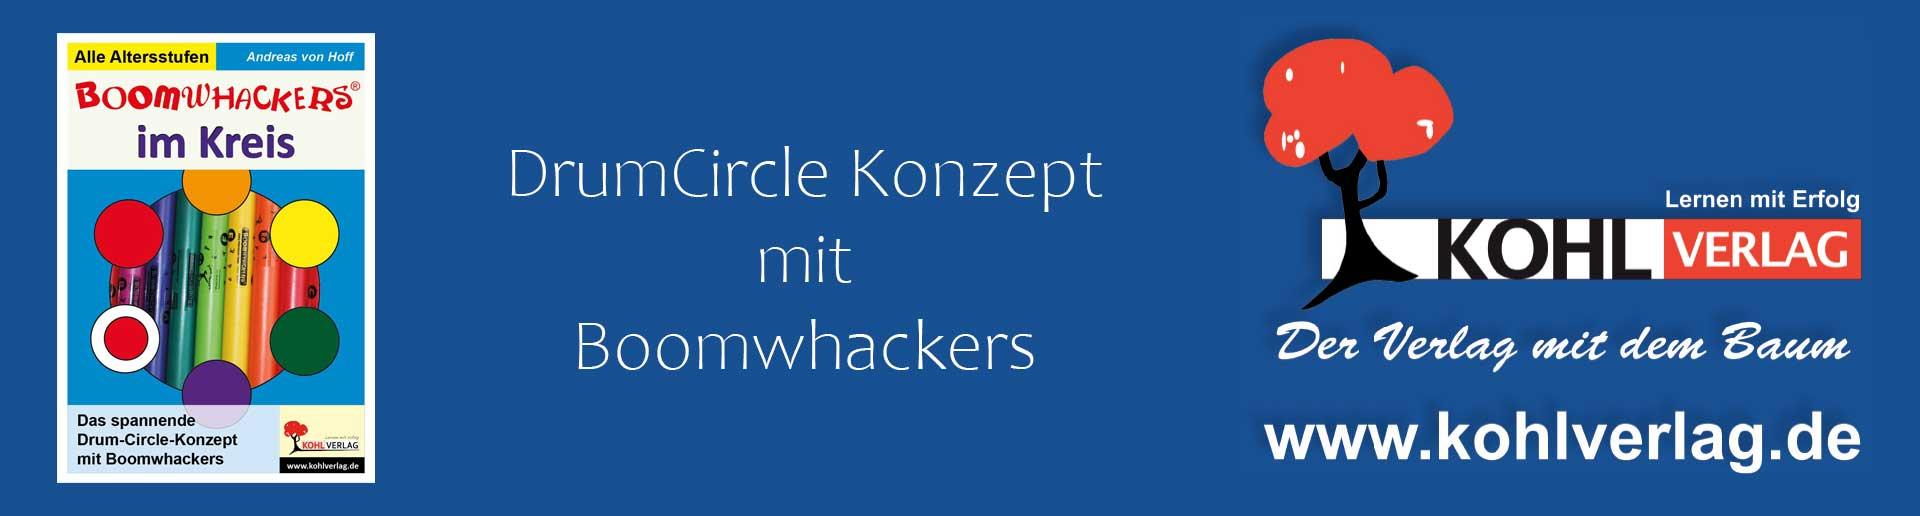 Boomwhackers im Kreis - DrumCircle Konzept mit Boomwhackers 4